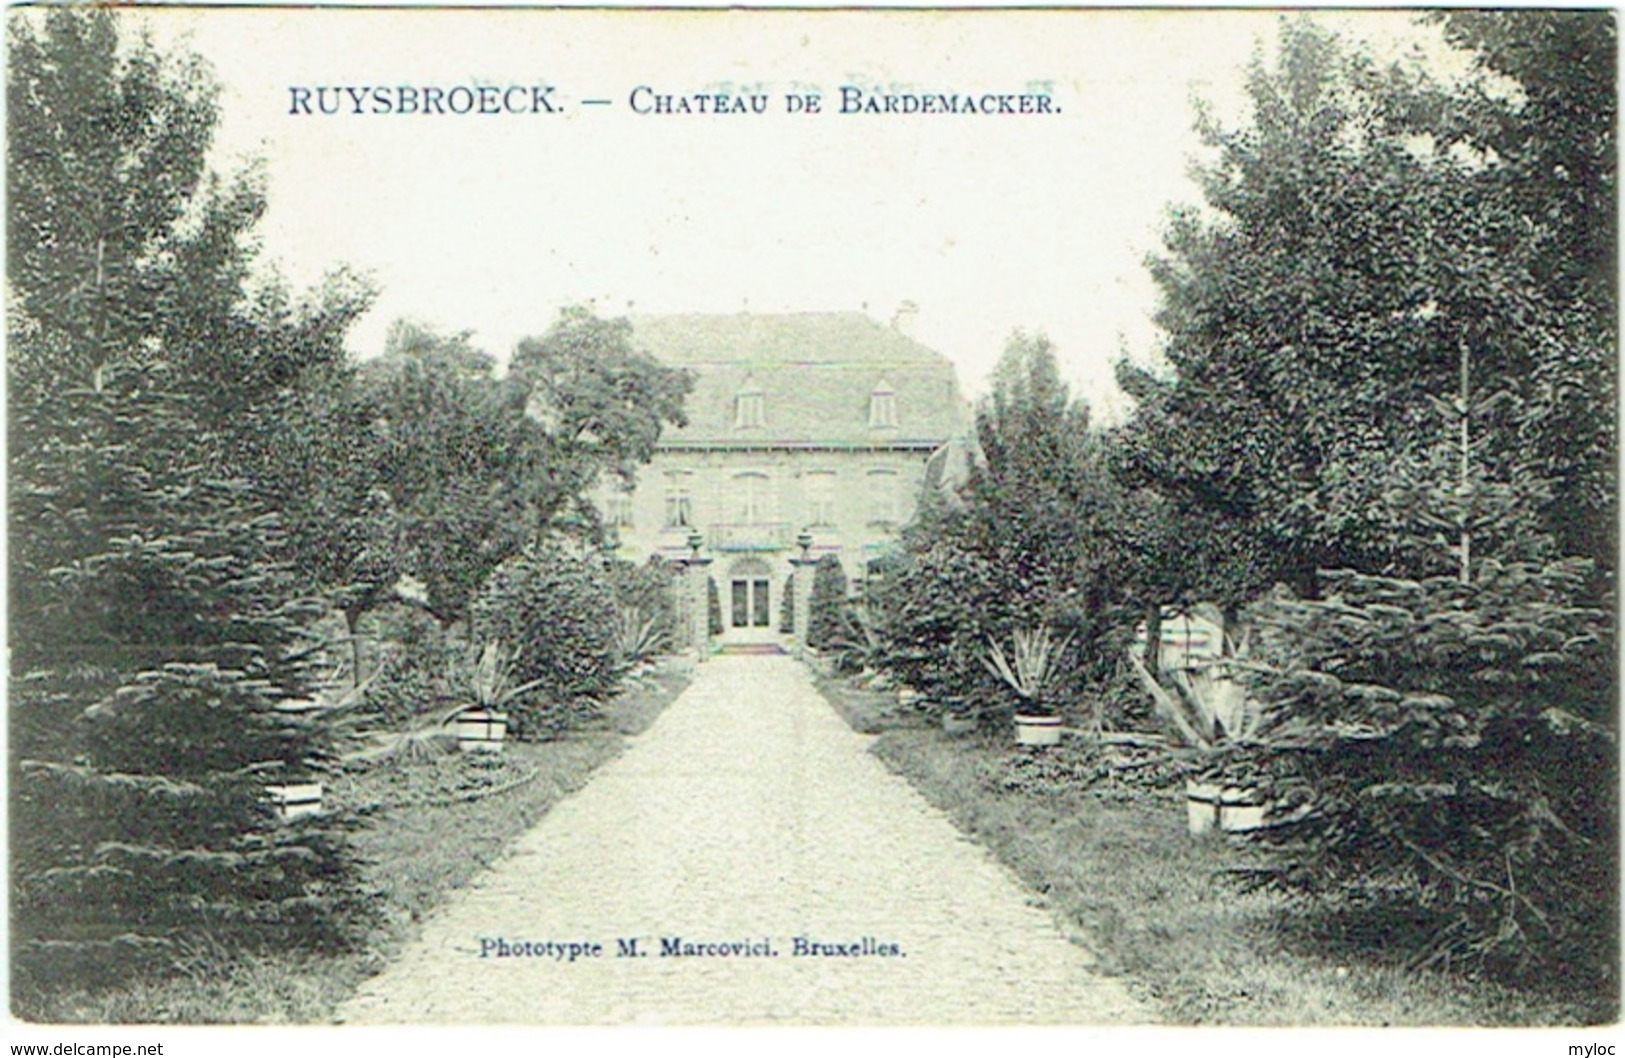 Ruisbroek. Ruysbroeck. Château De Bardemacker. - Sint-Pieters-Leeuw